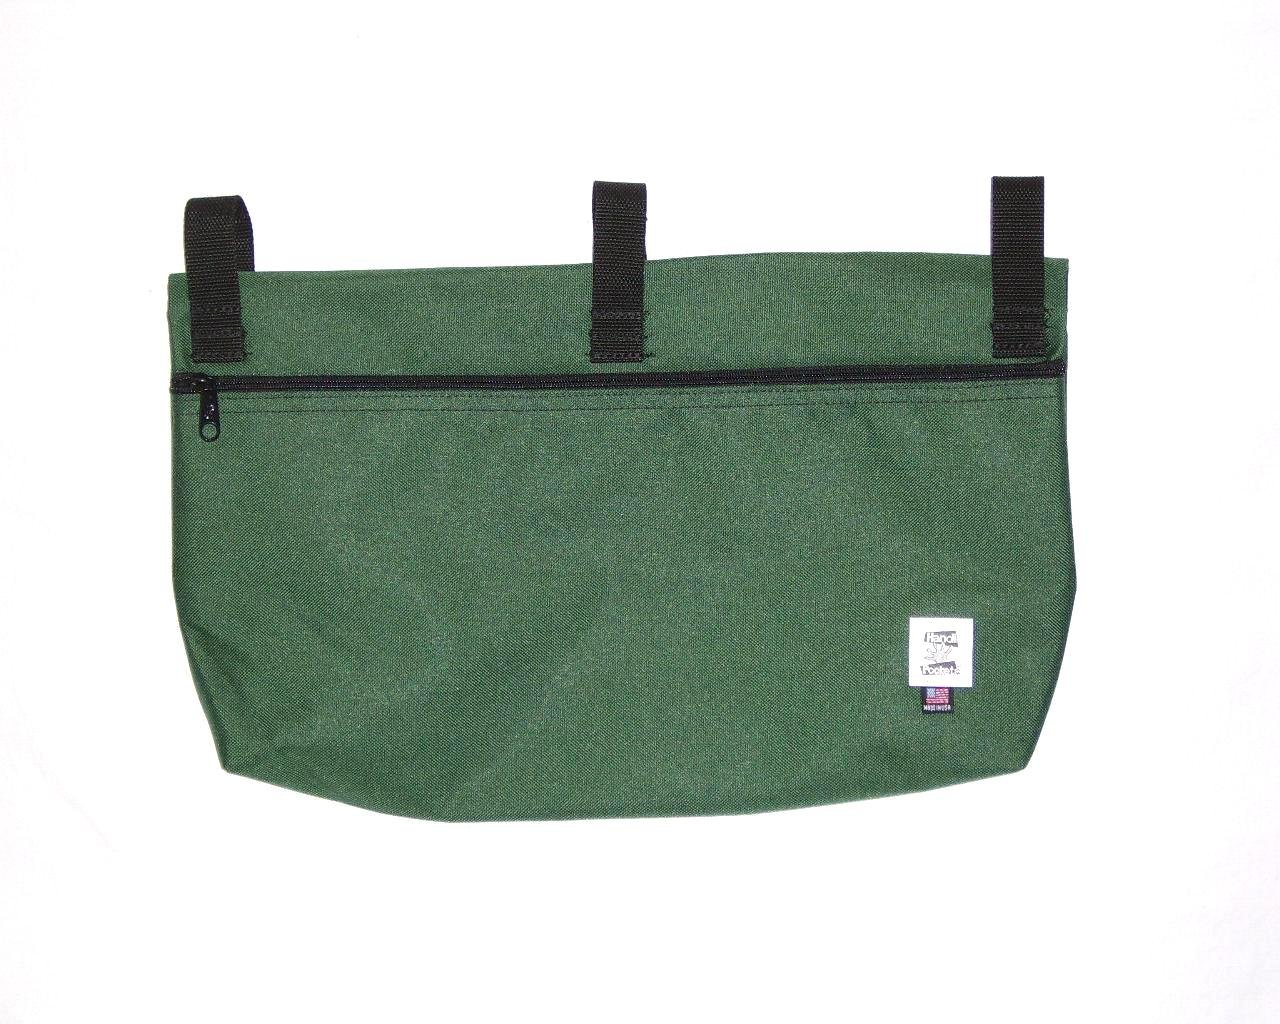 Handi Pockets 2b6fg Storage Accessory Walker, Cordura, Forest Green with Zipper